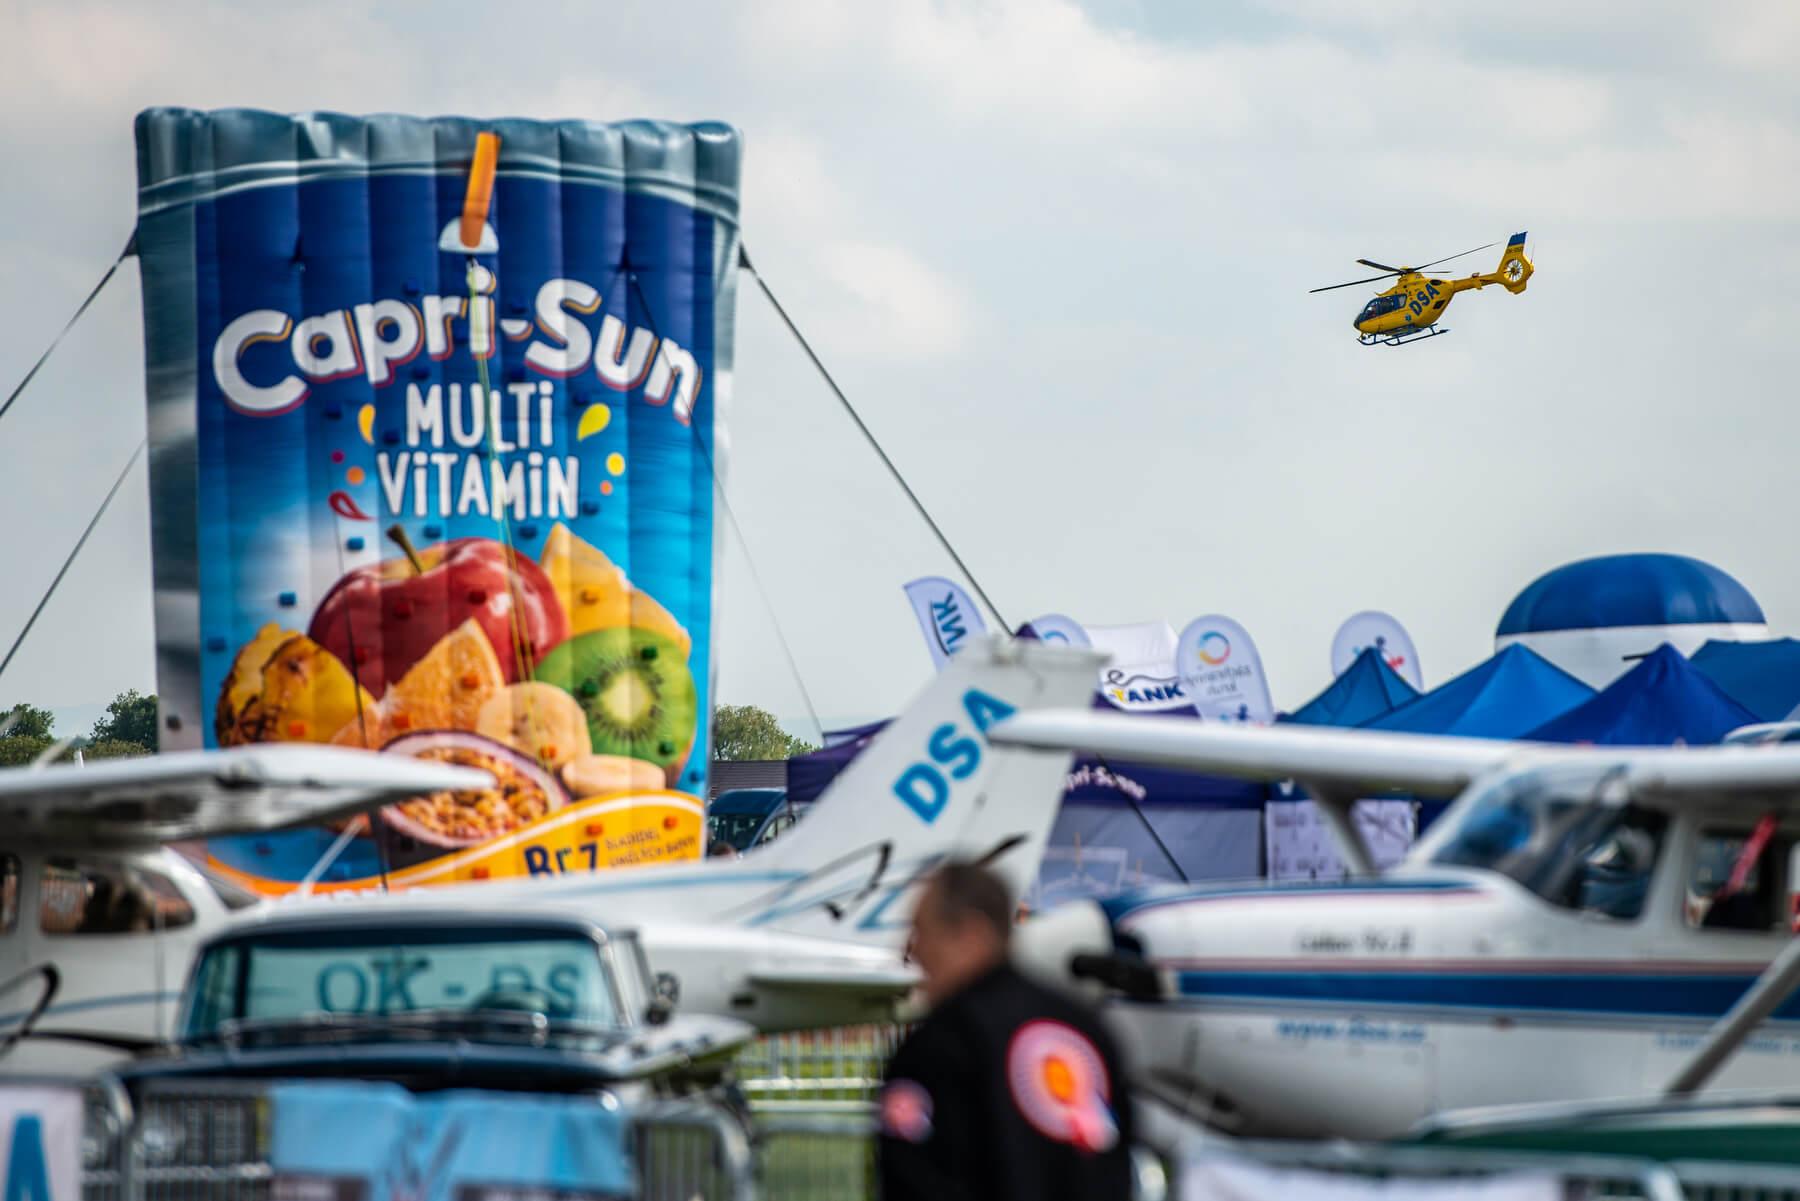 Capri-Sun Roadshow helicopter show